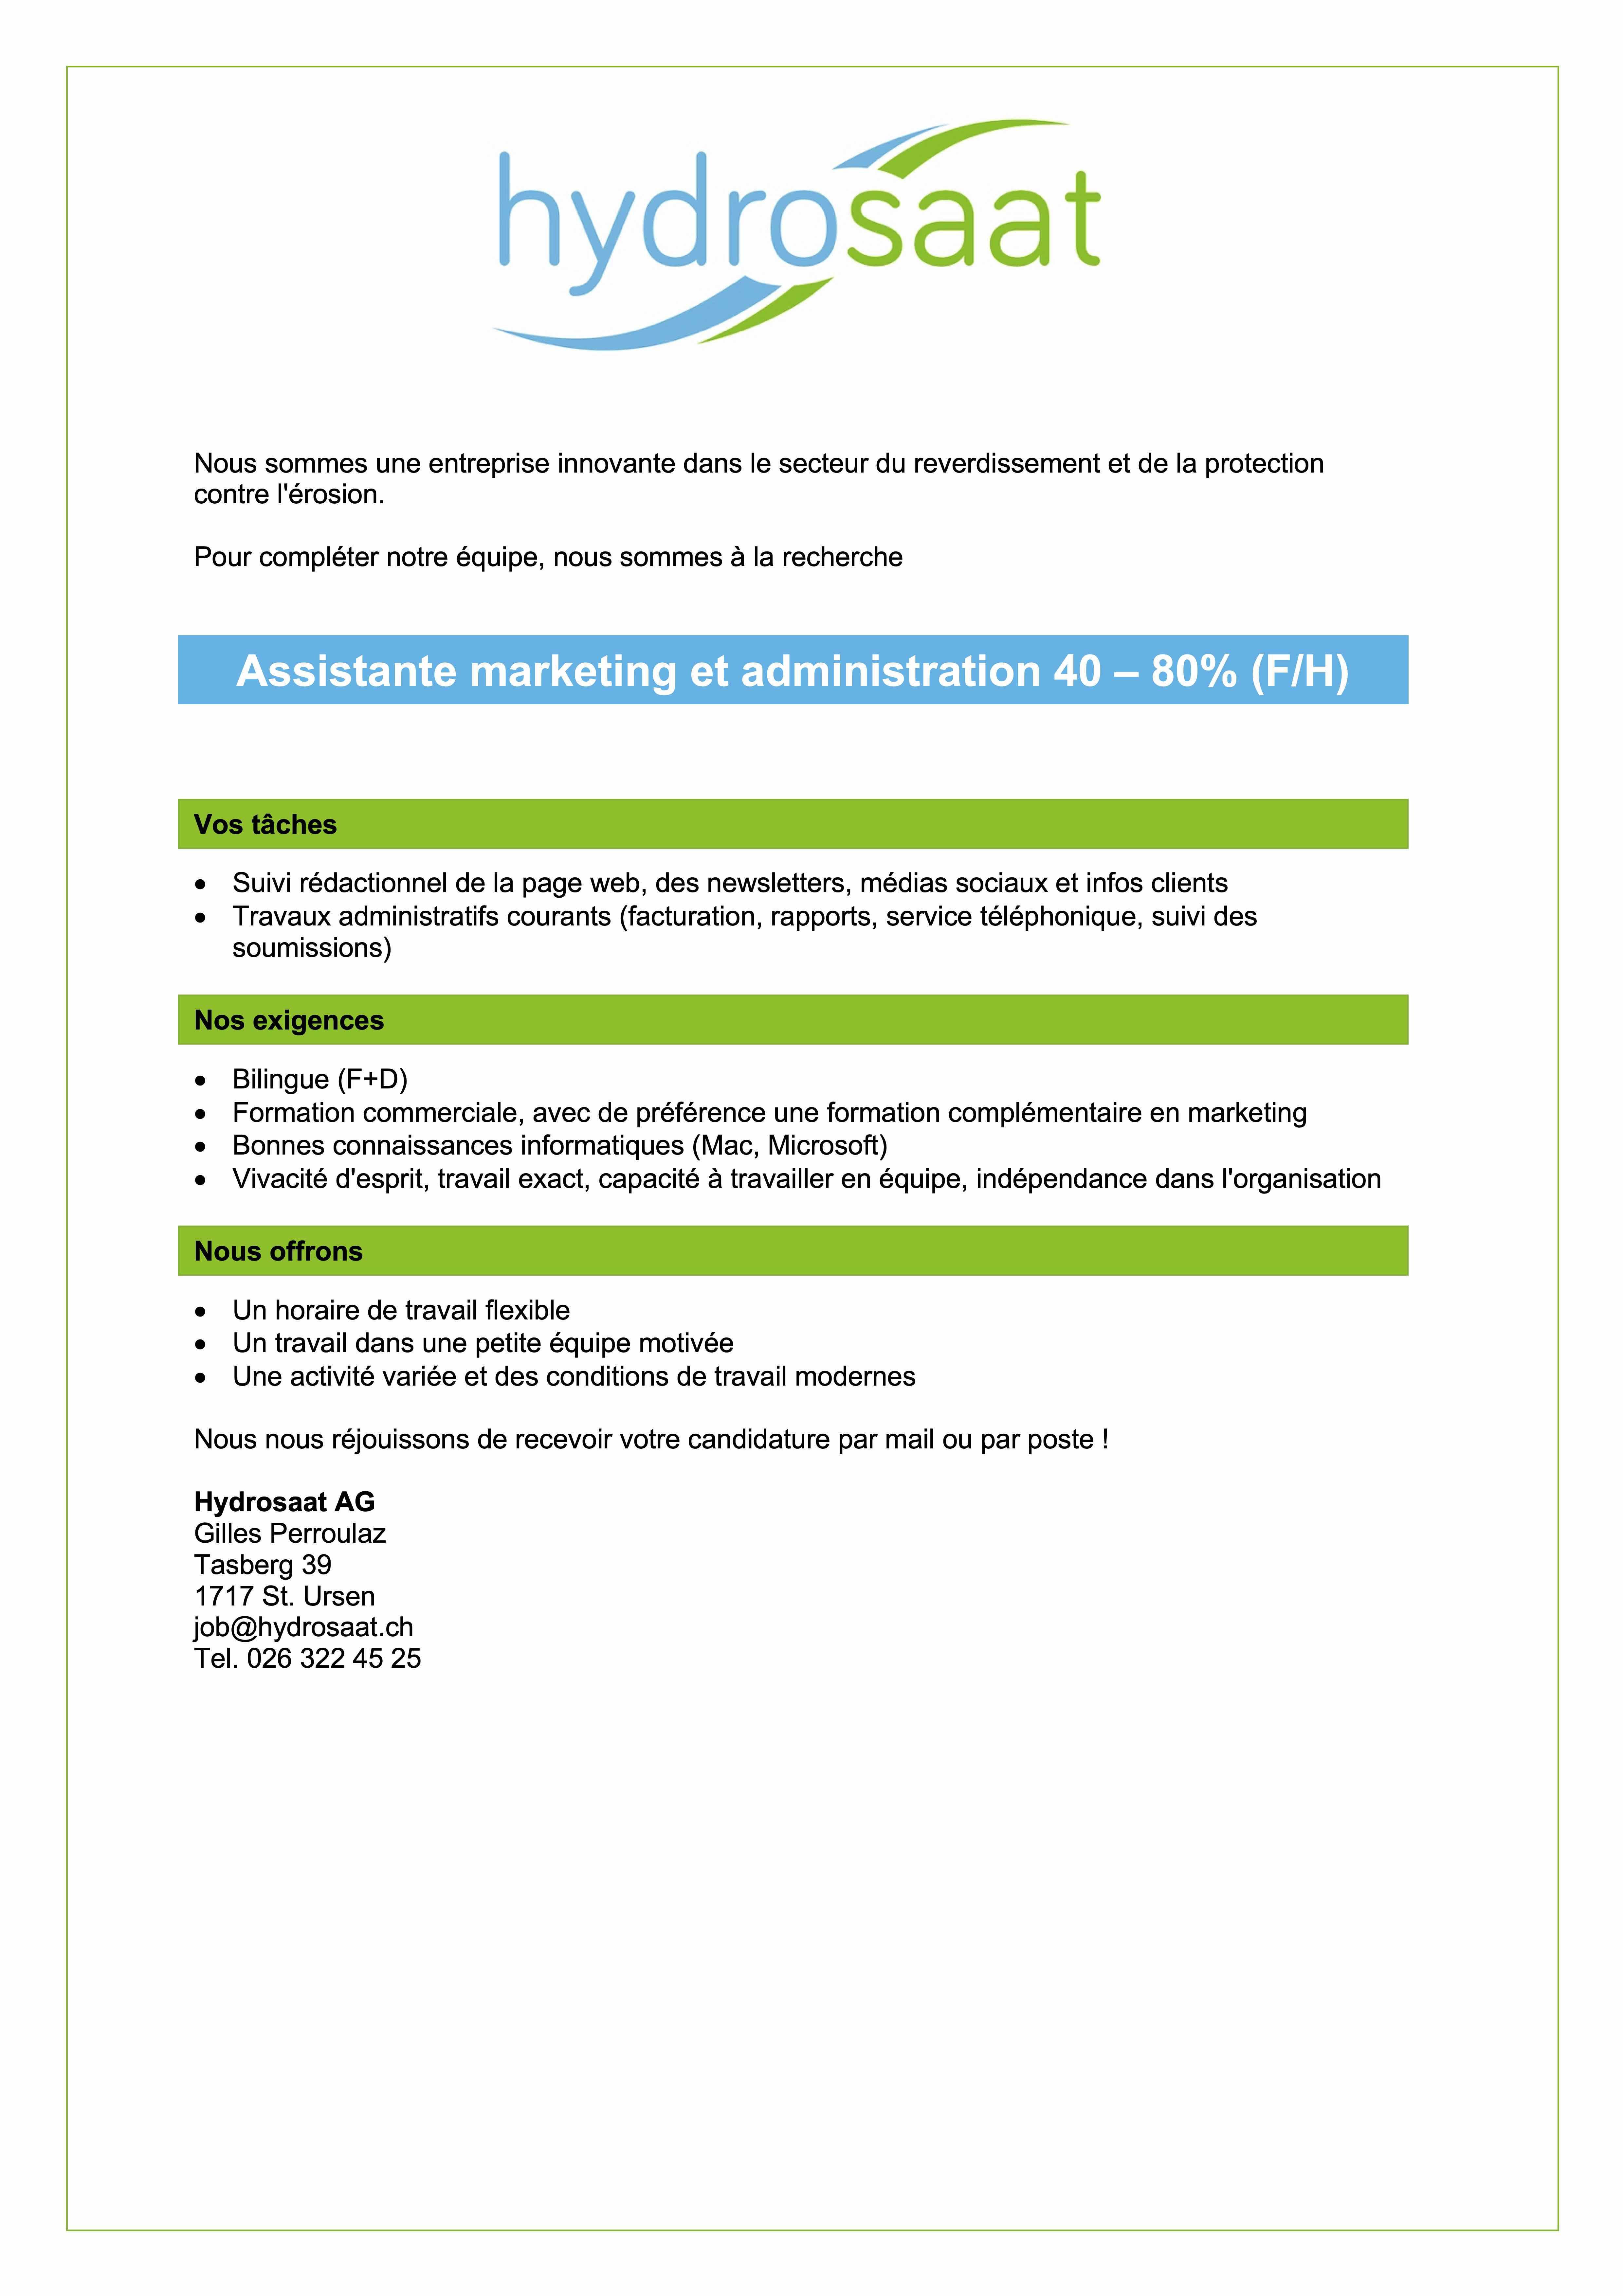 Assistante marketing et administration F/H